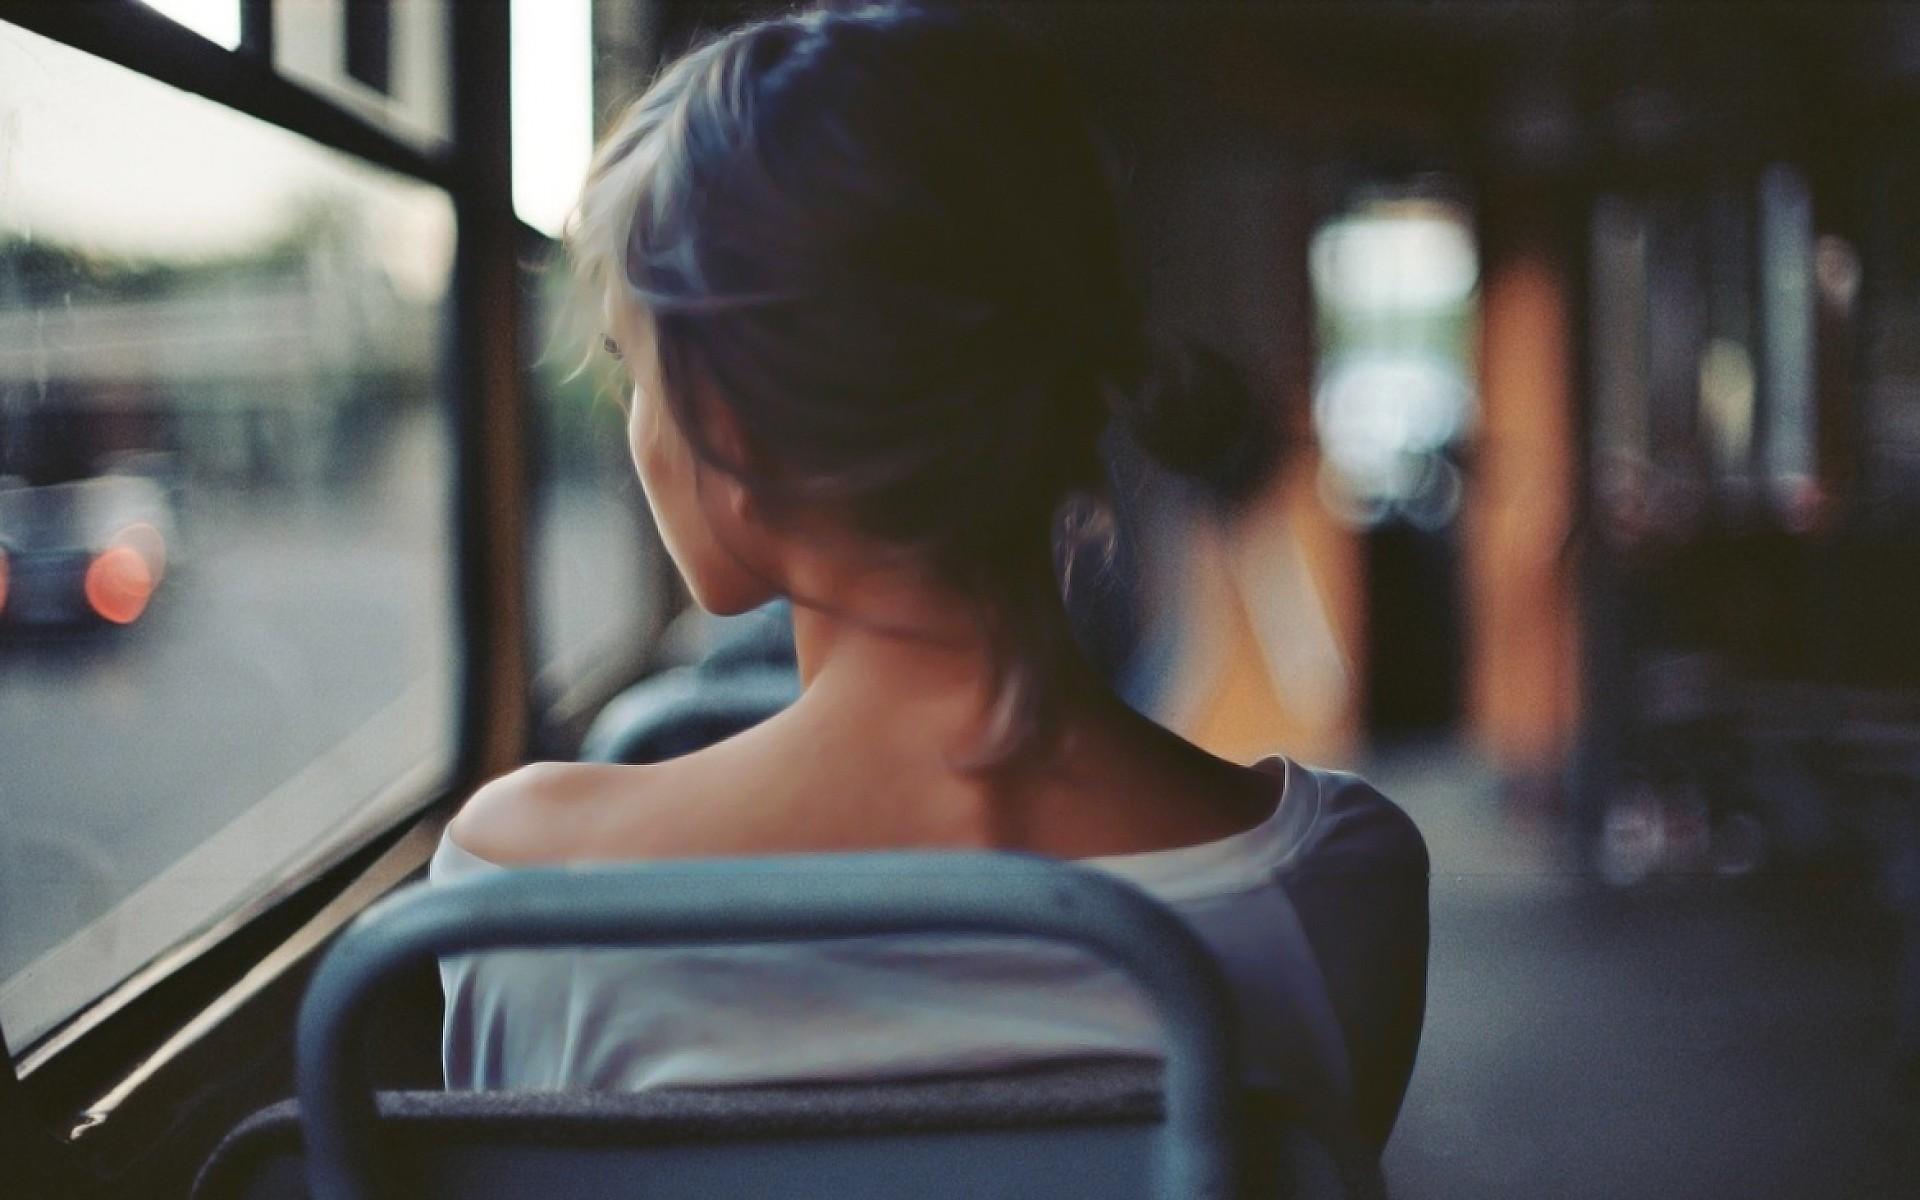 Women back buses hd girls 4k wallpapers images backgrounds women back buses voltagebd Images